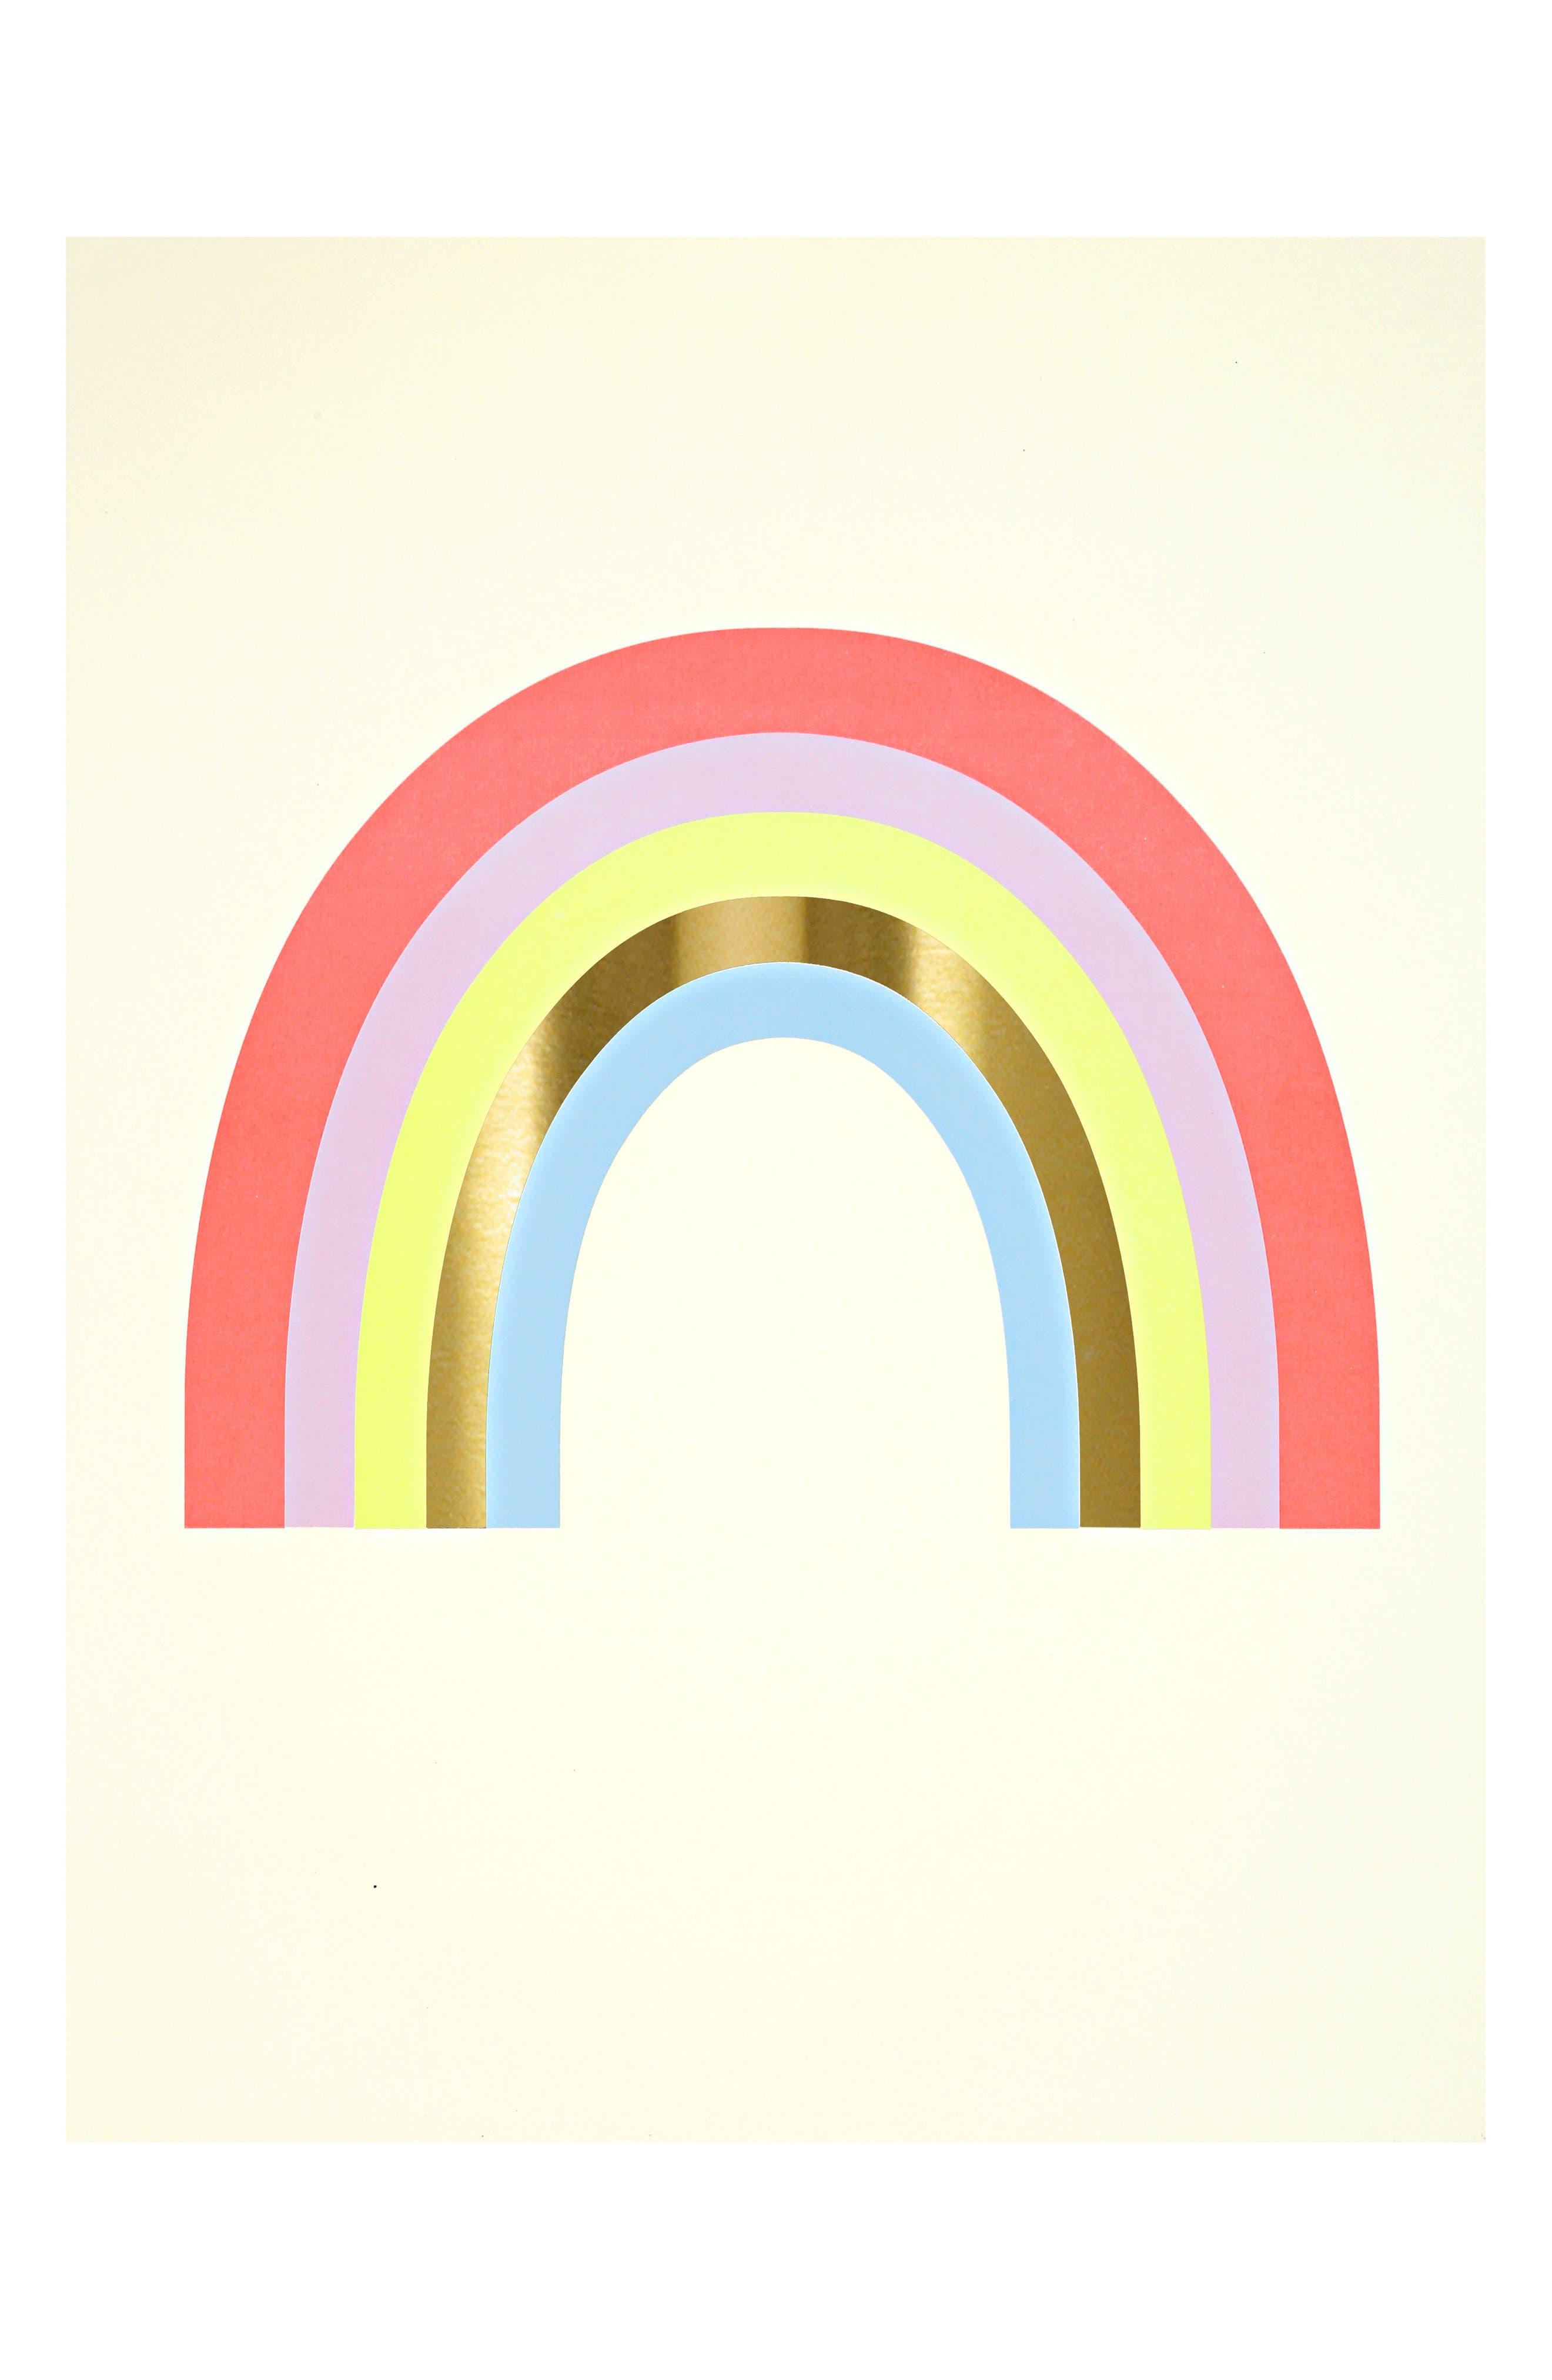 Unicorn & Rainbow 2-Piece Art Print Set,                             Alternate thumbnail 2, color,                             PINK